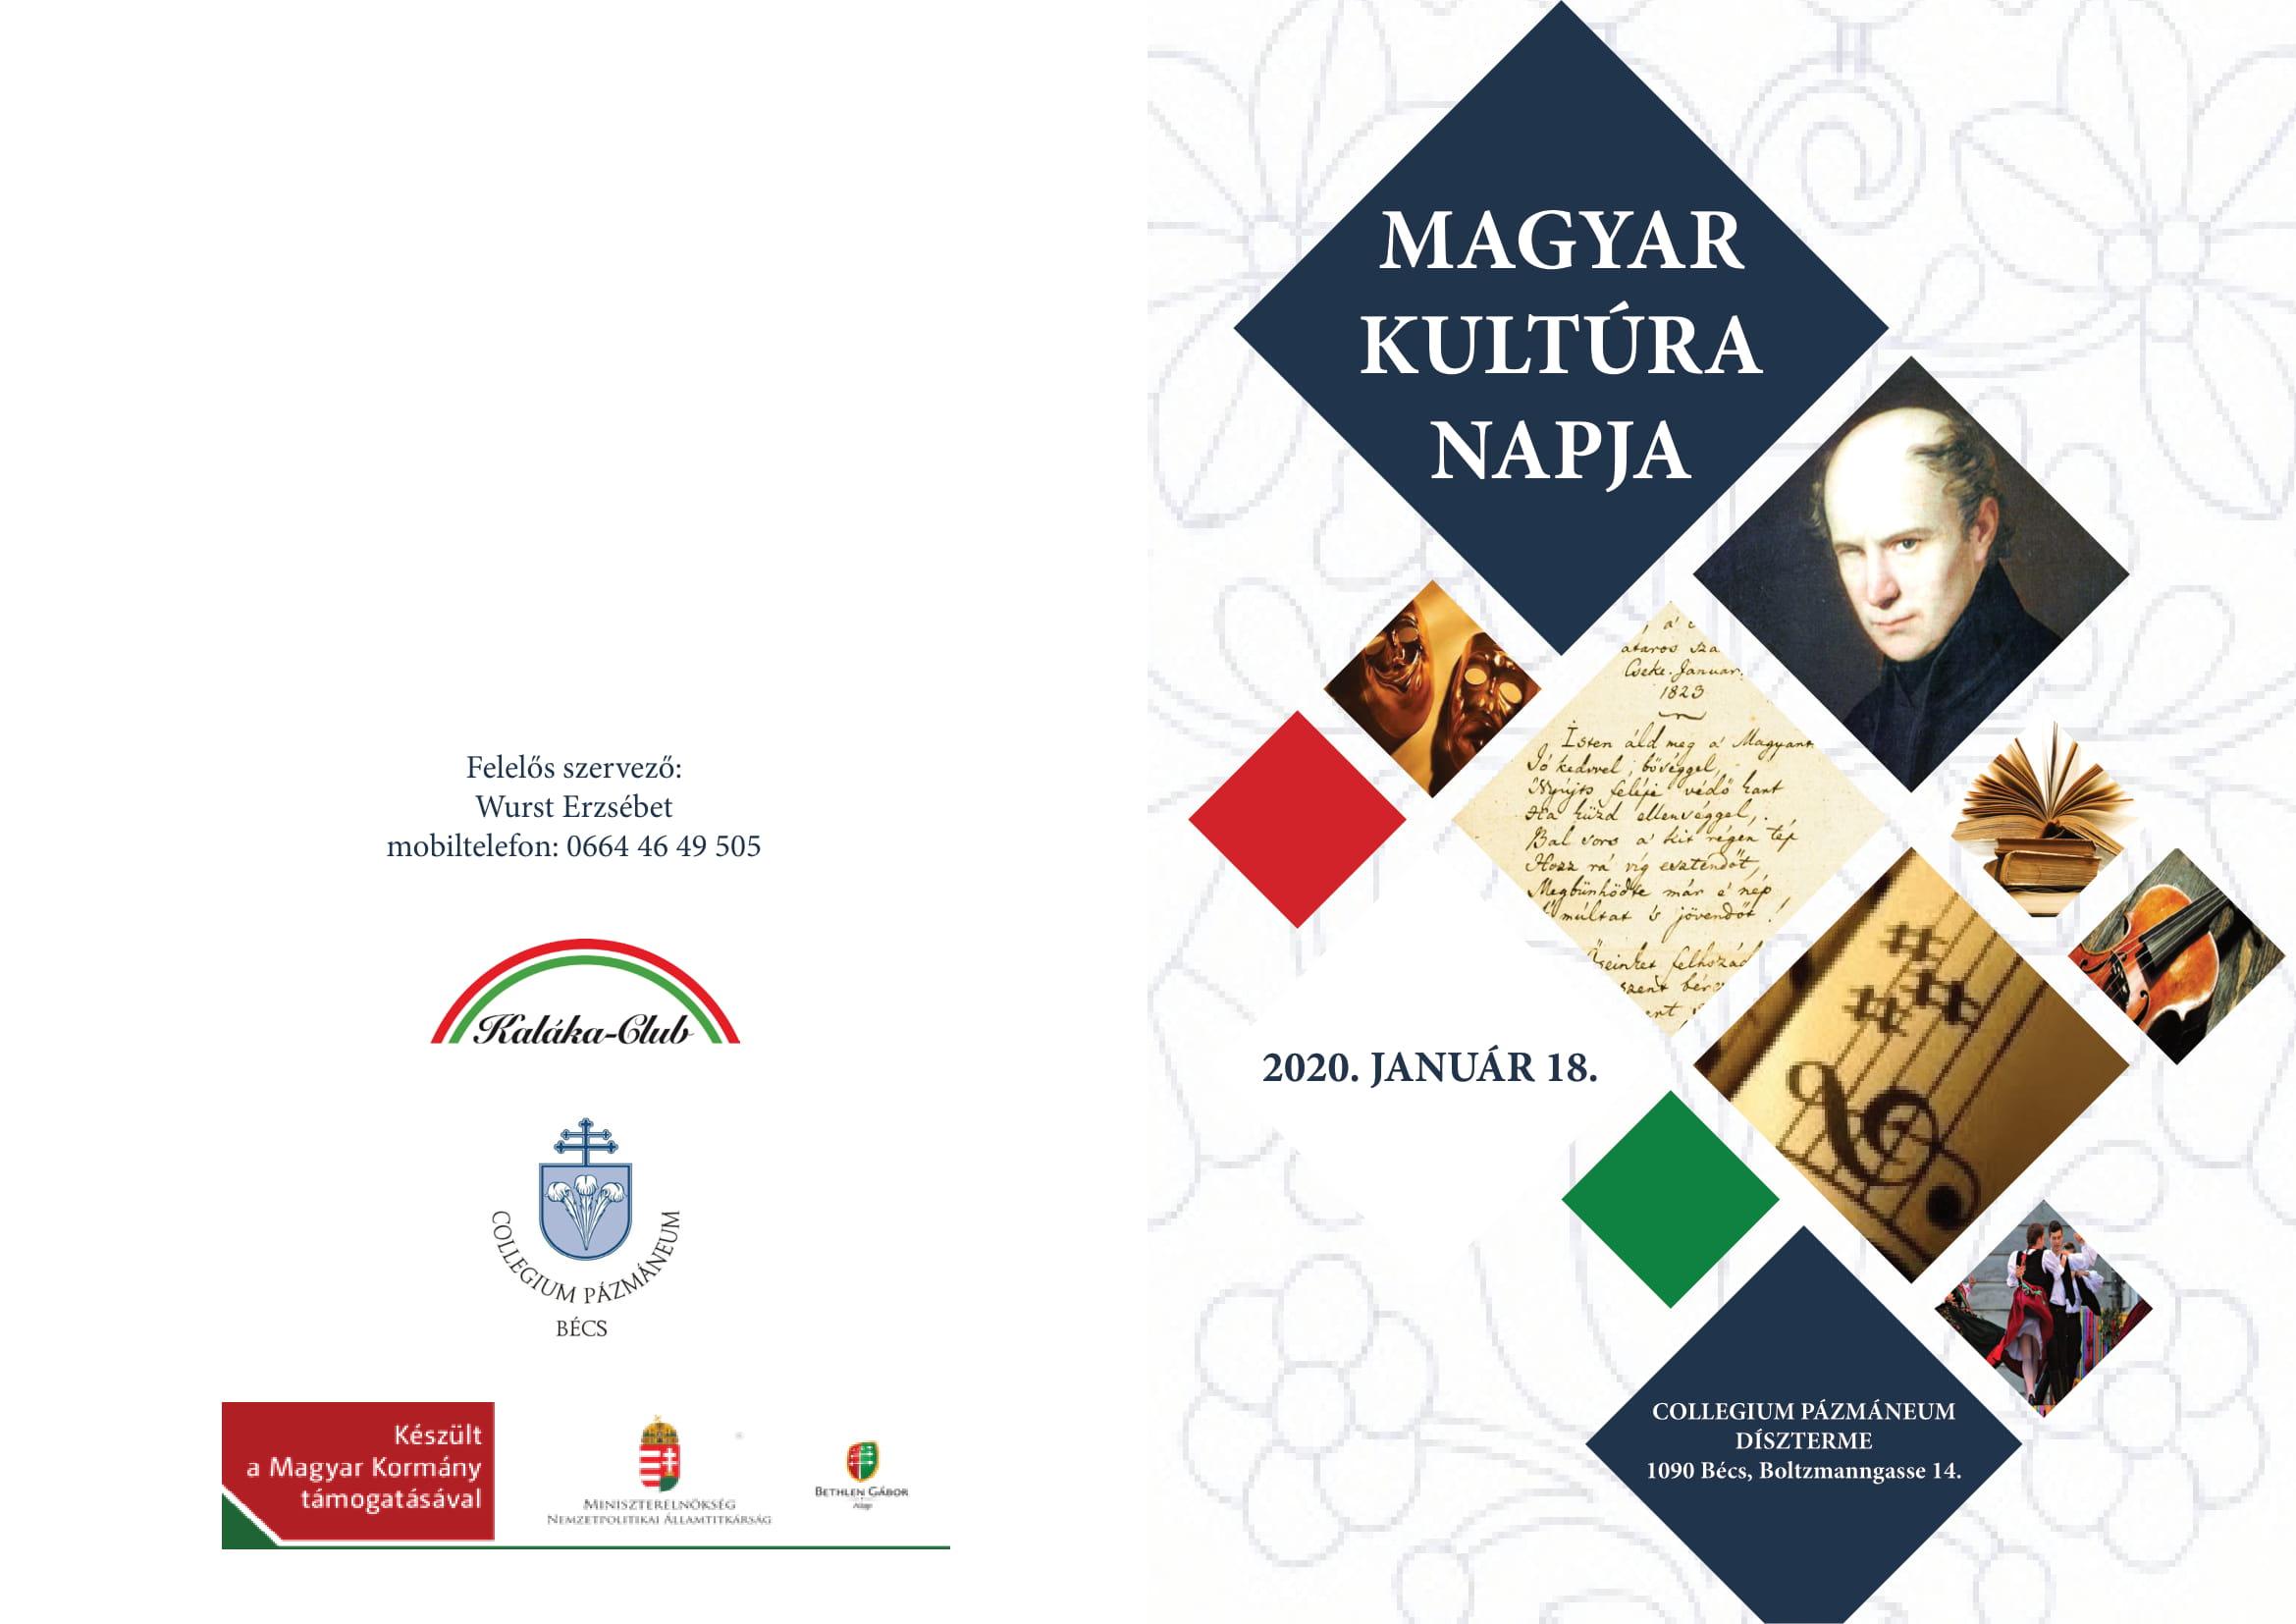 Magyar Kultúra Napja – 2020.01.18